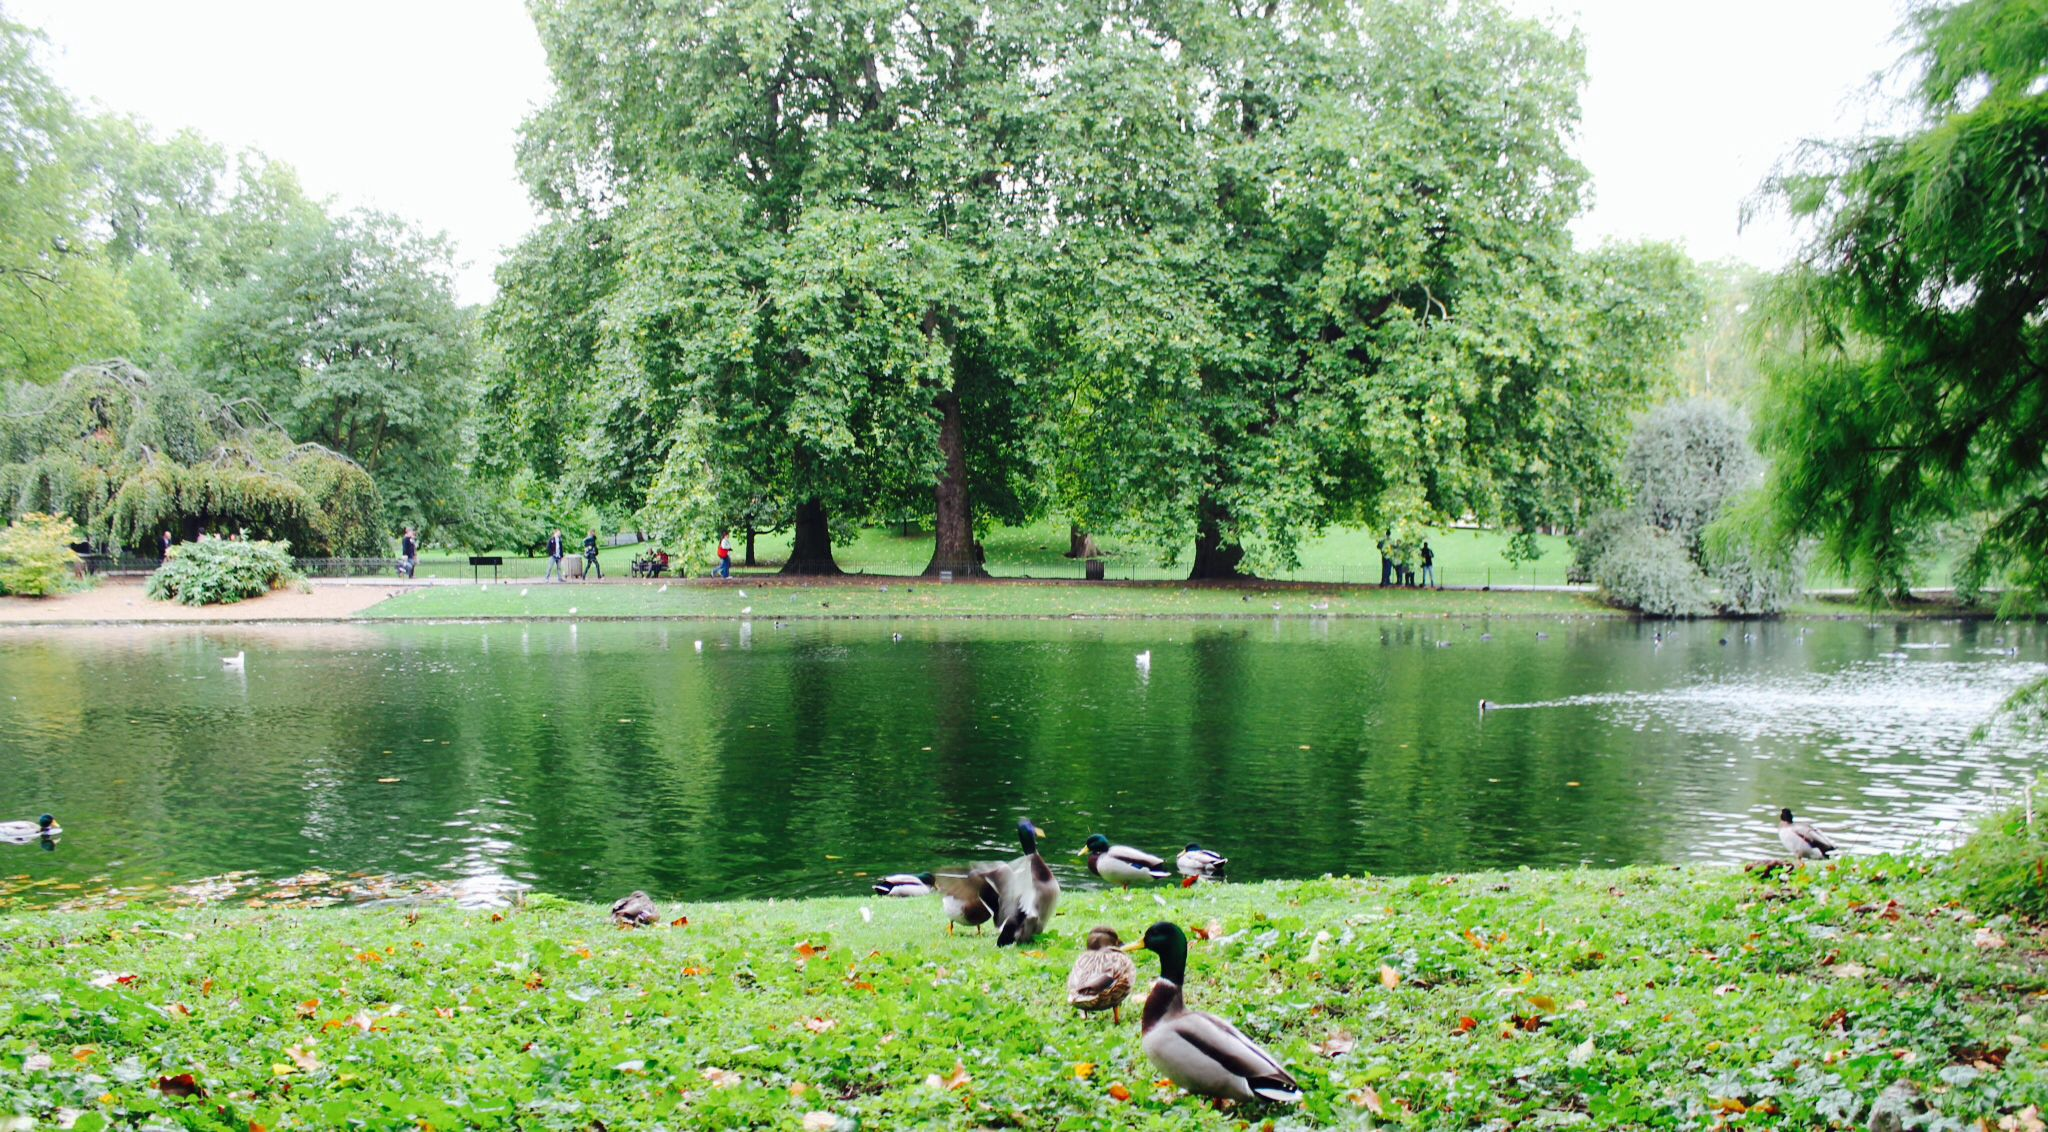 St. James, London